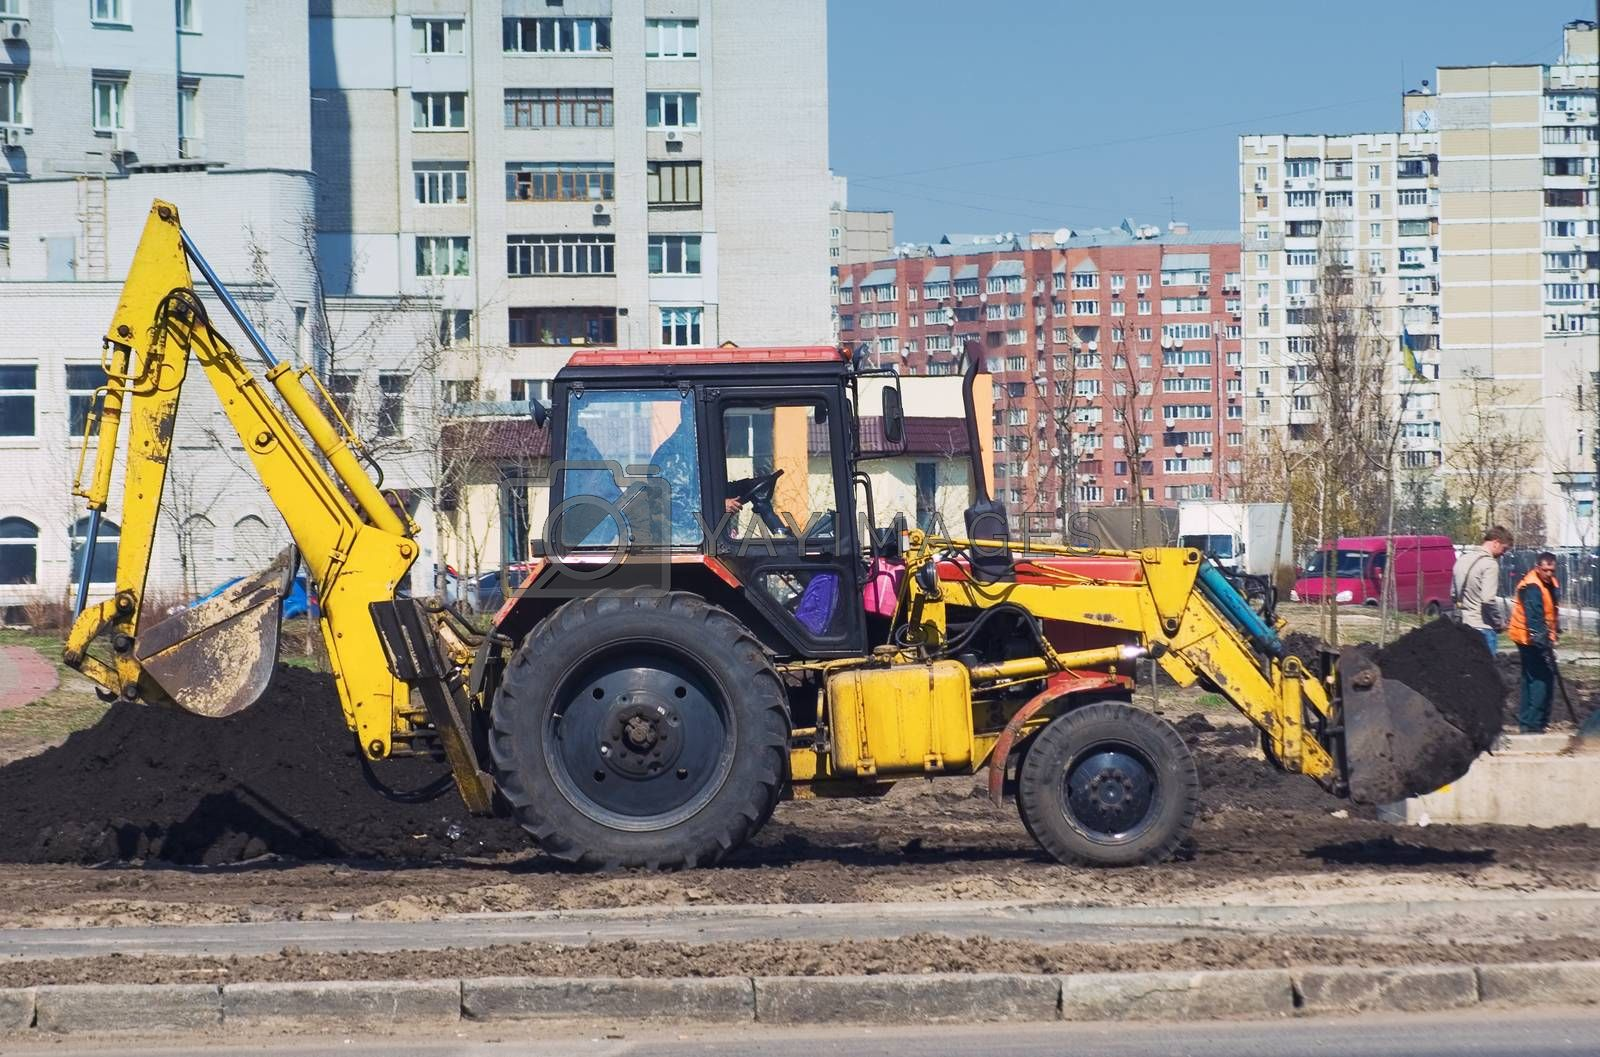 tractor working on urban street improvement